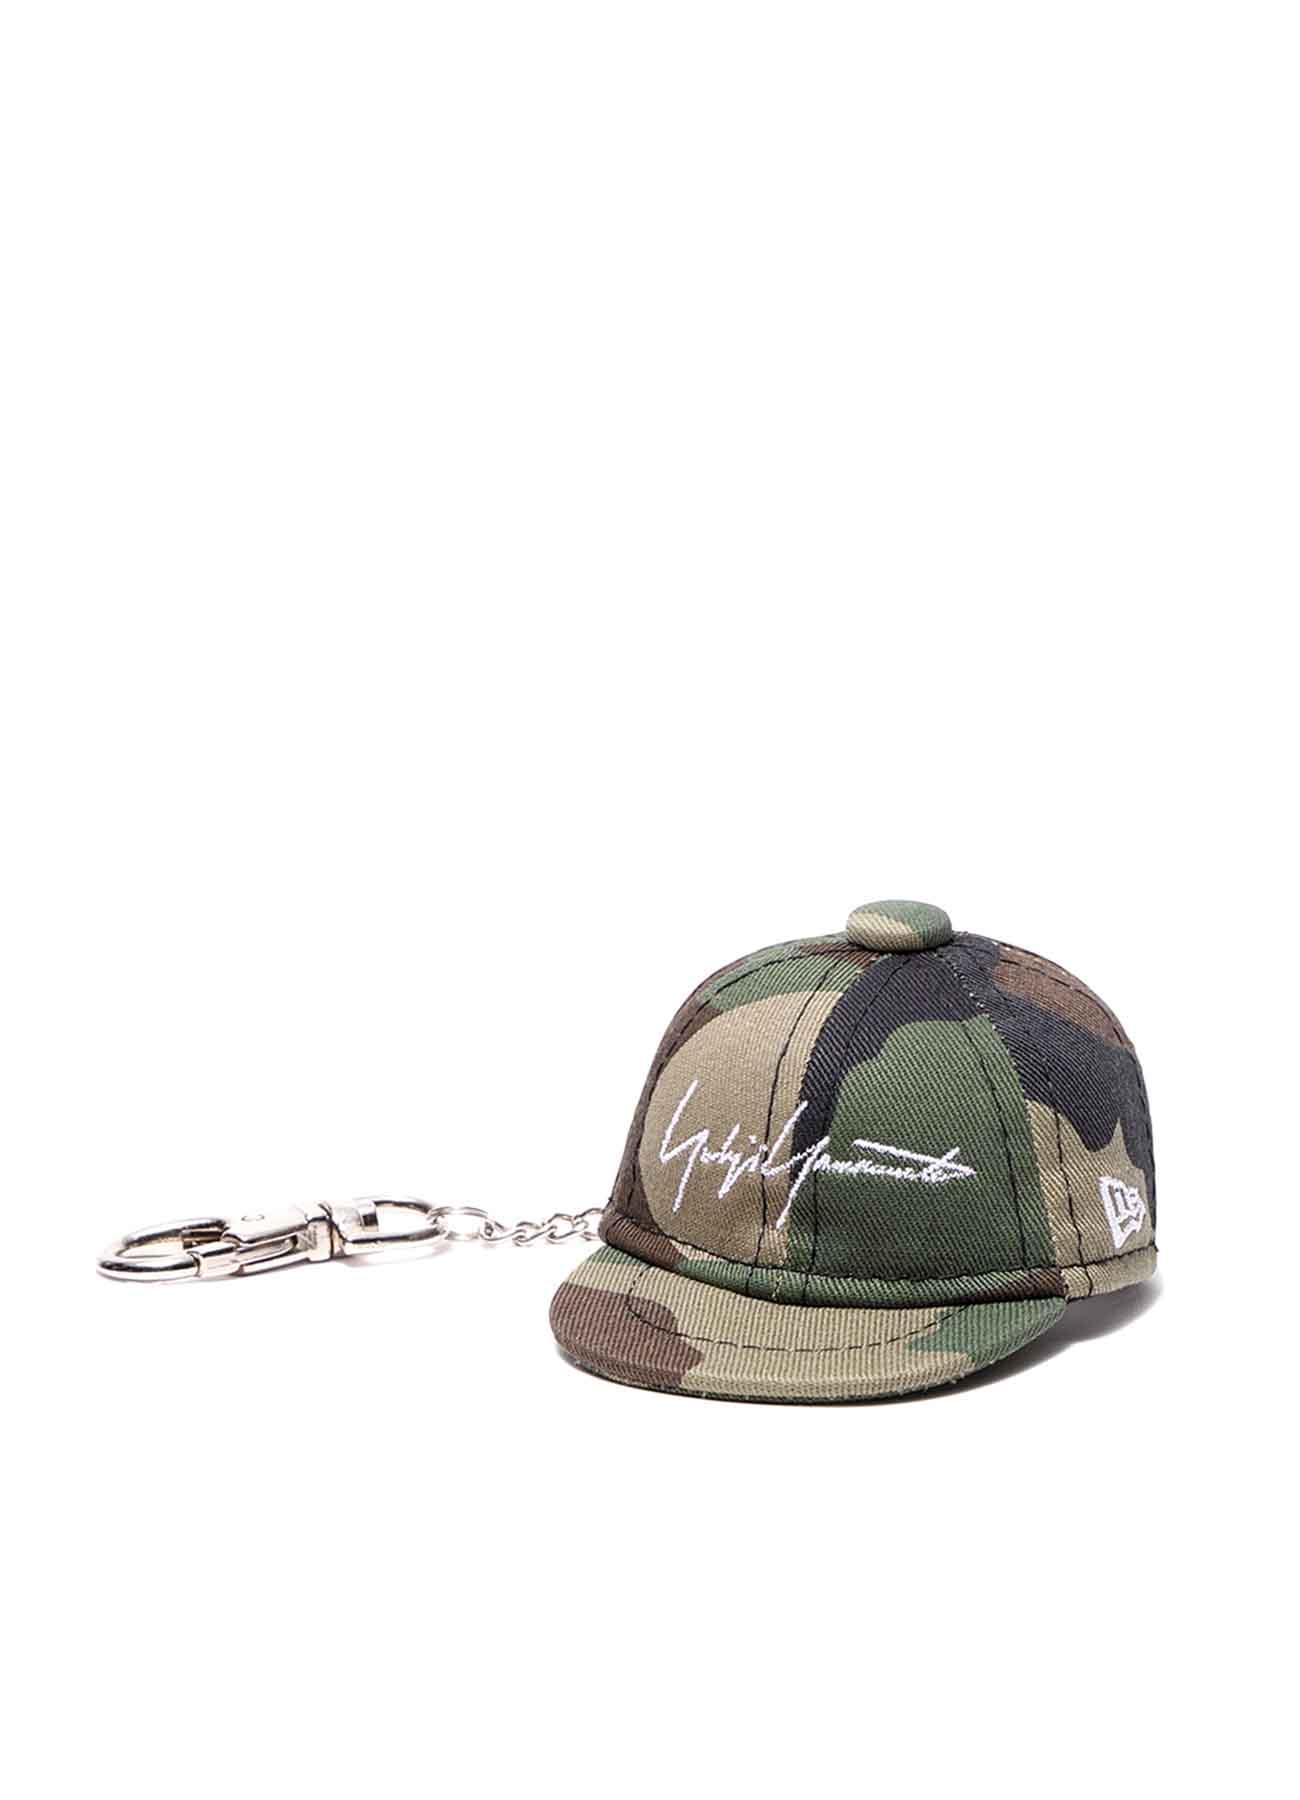 Yohji Yamamoto × New Era BLACK SERGE CAP KEYHOLDER CAMOUFLAGE